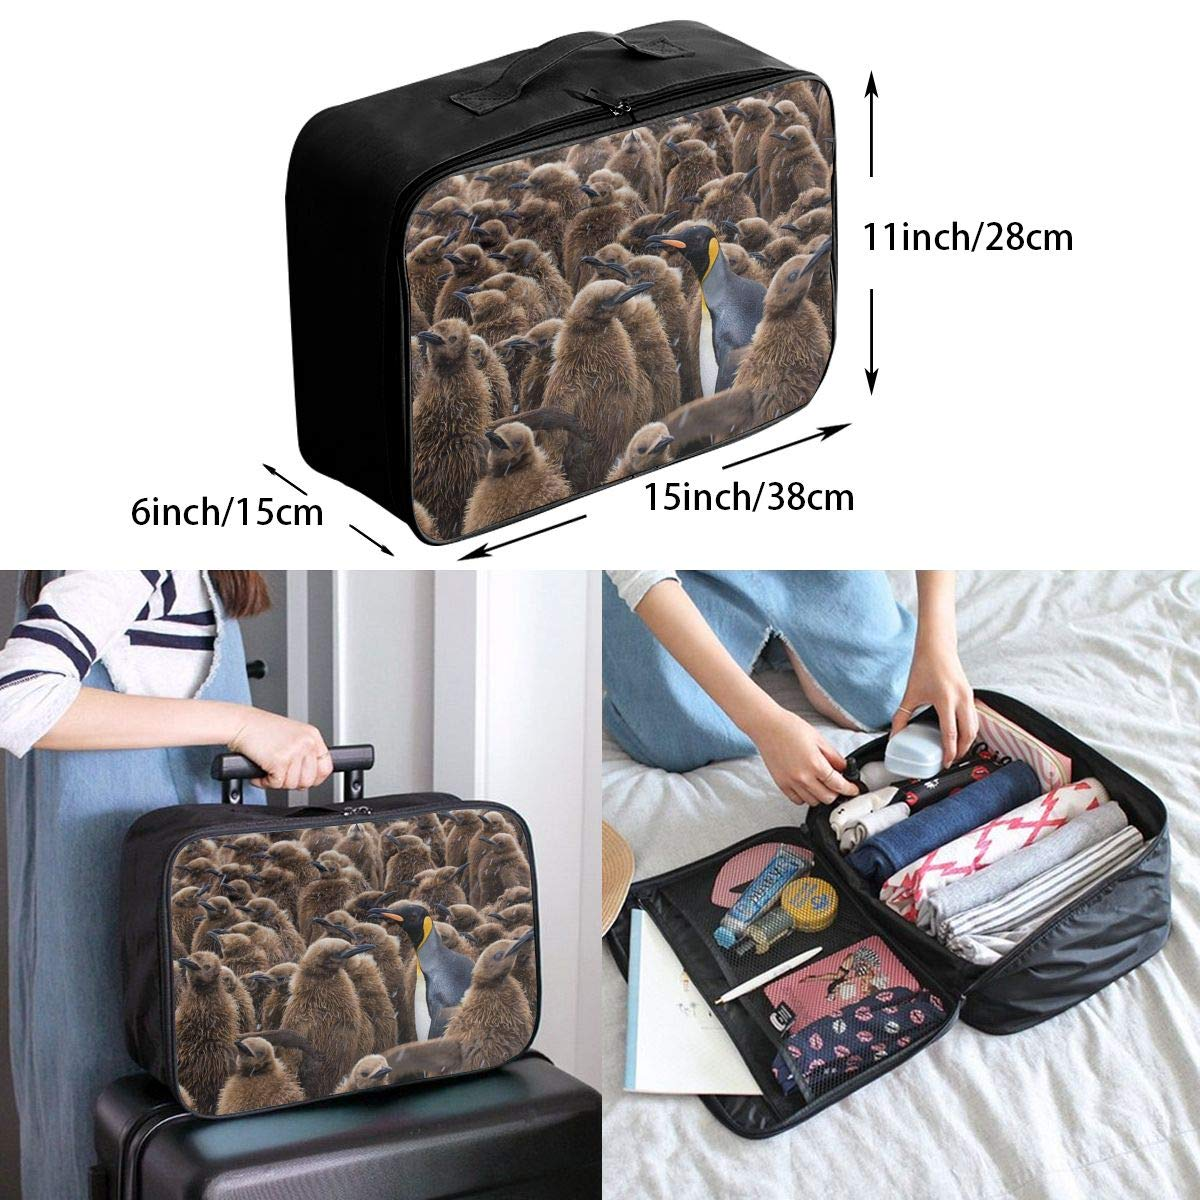 Travel Luggage Duffle Bag Lightweight Portable Handbag Penguins Large Capacity Waterproof Foldable Storage Tote